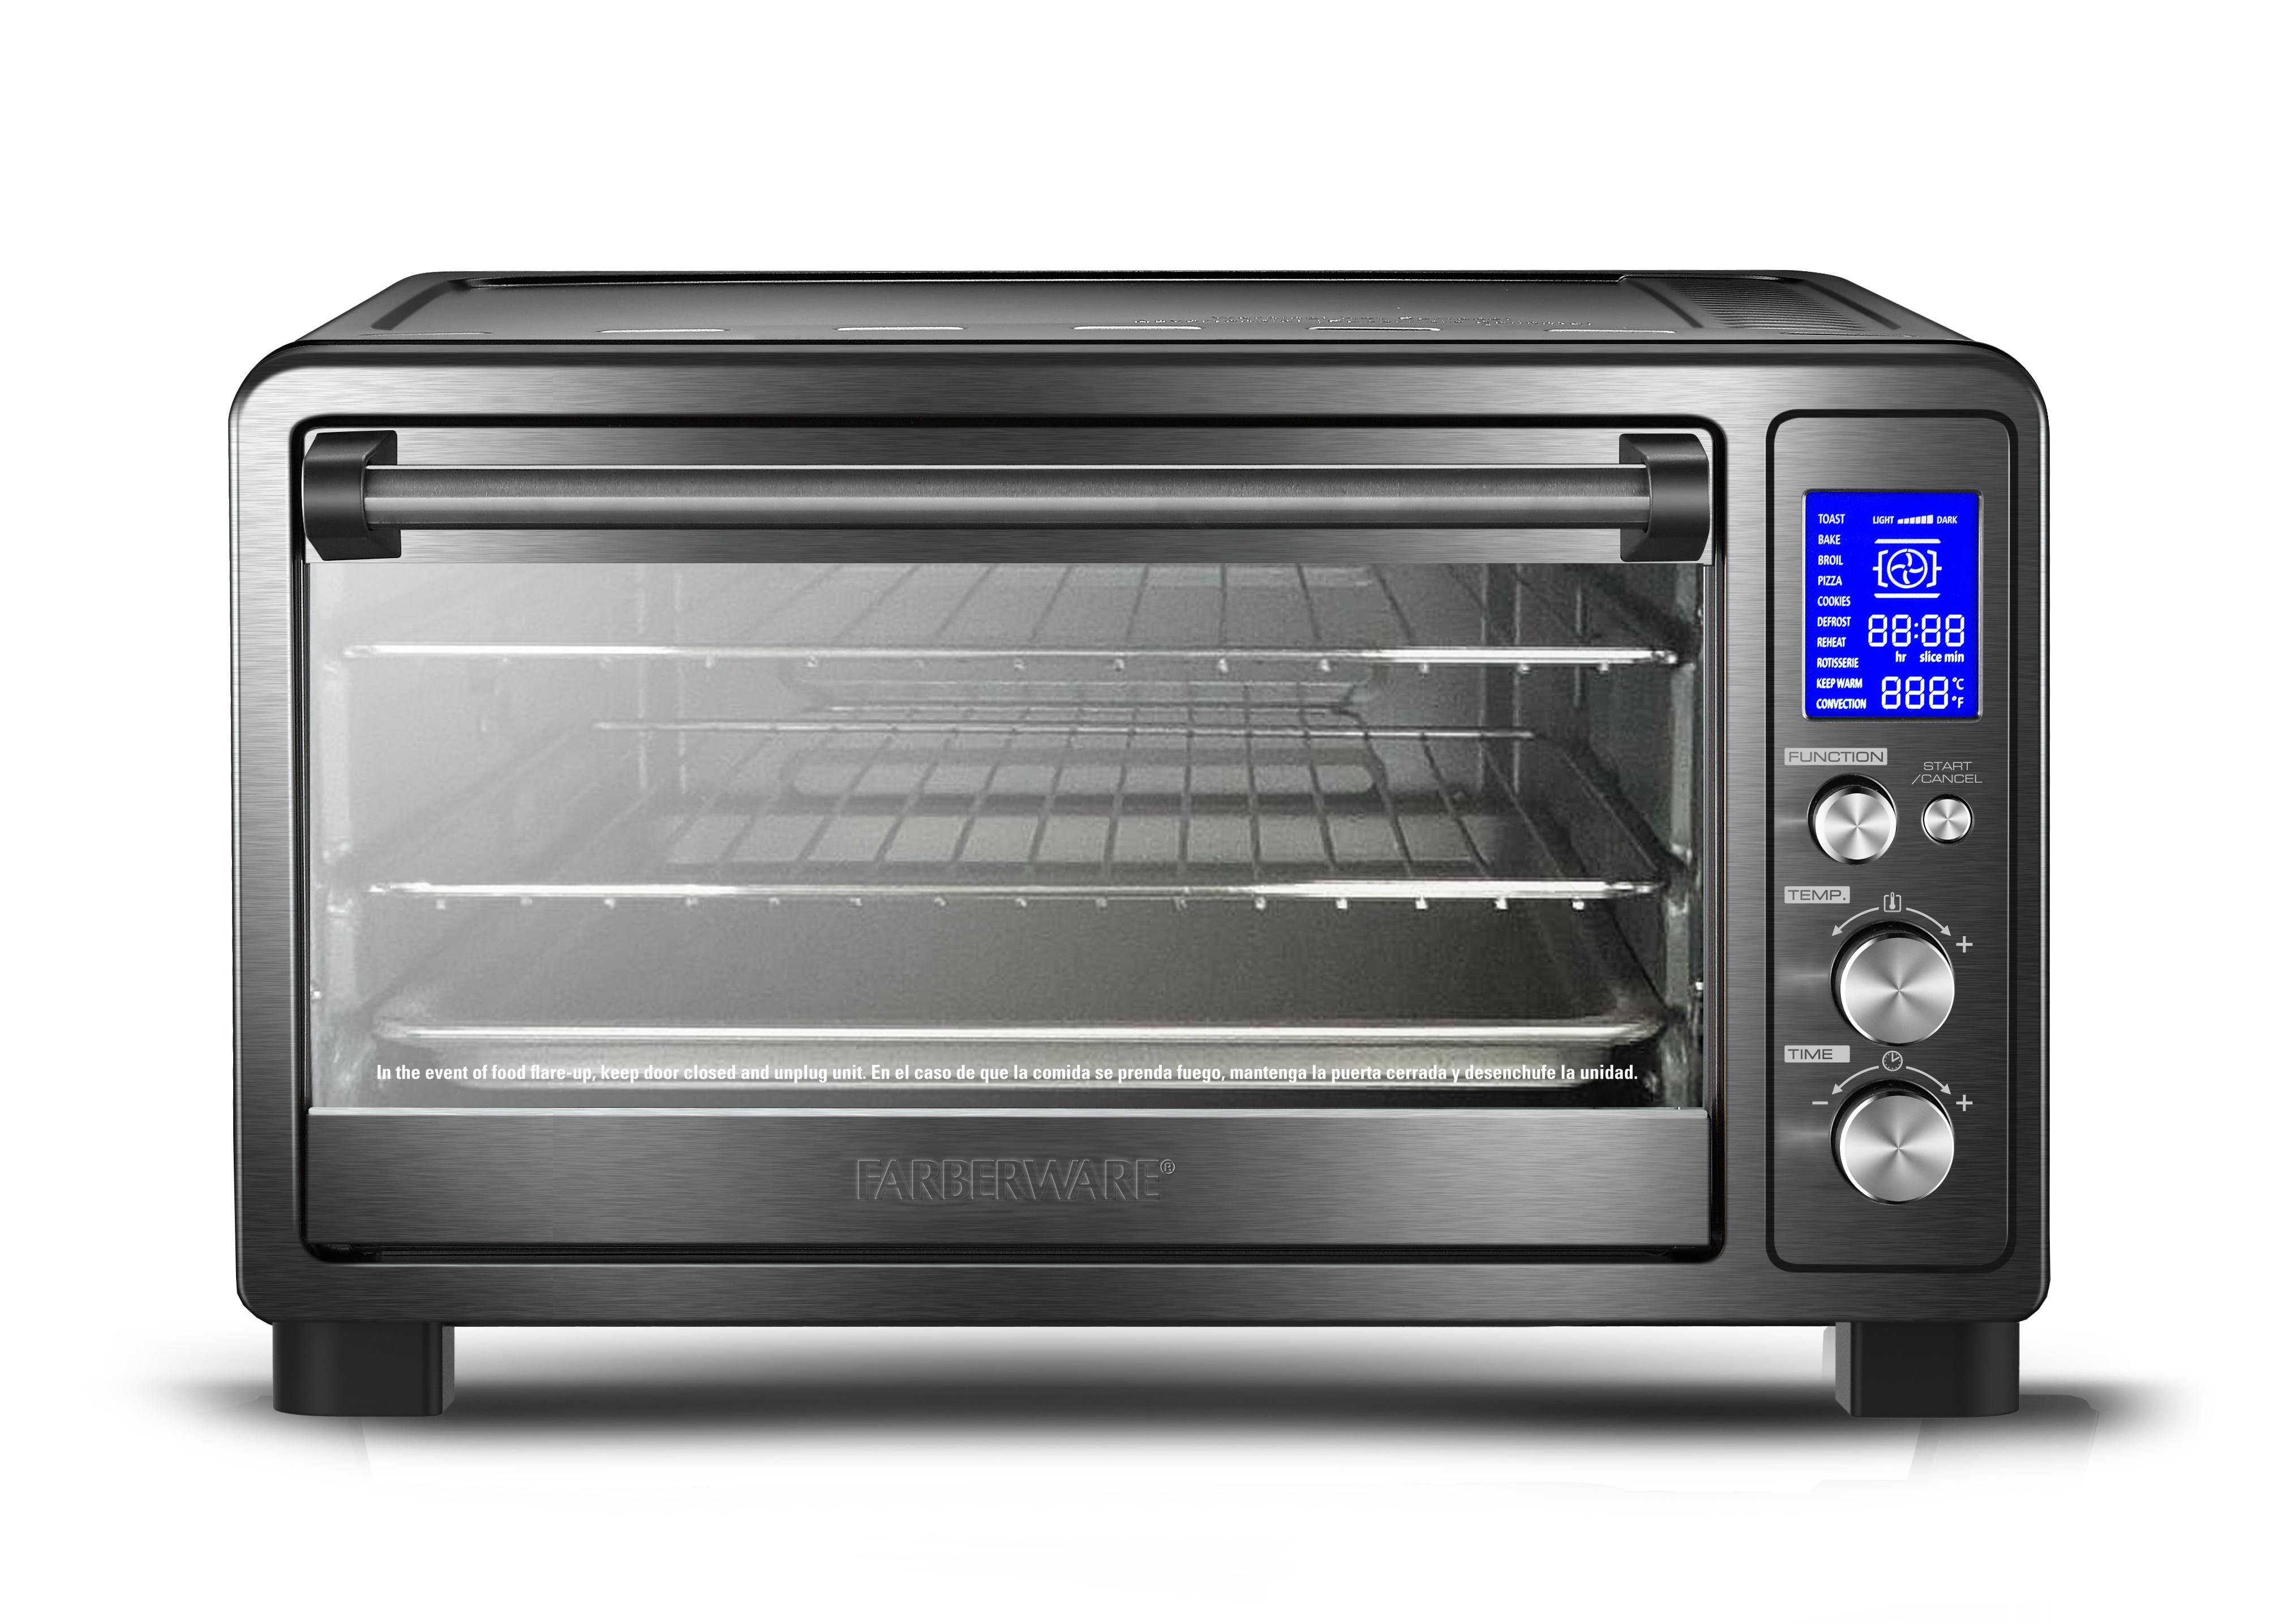 Farberware Black & Stainless Steel Toaster Oven